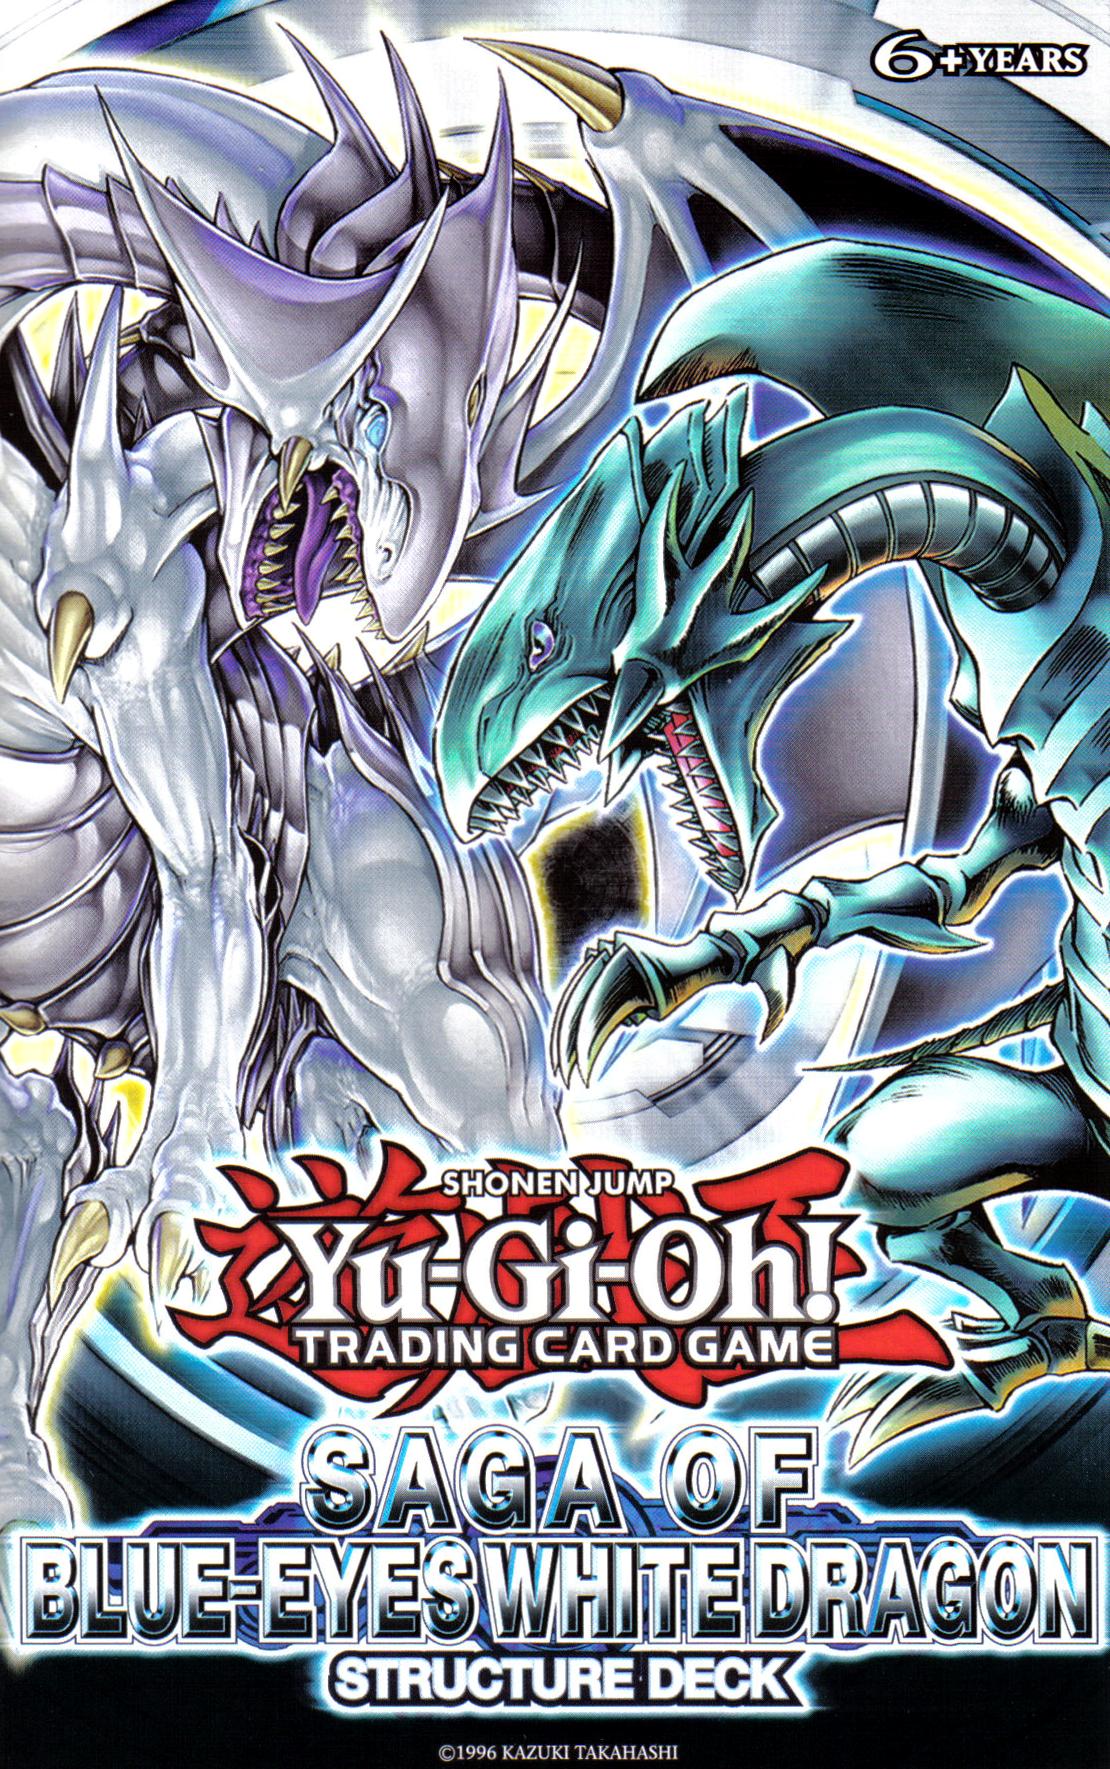 Yu-gi-oh 1x Alexandrite Dragon-sdbe-saga of blue eyes white dragon